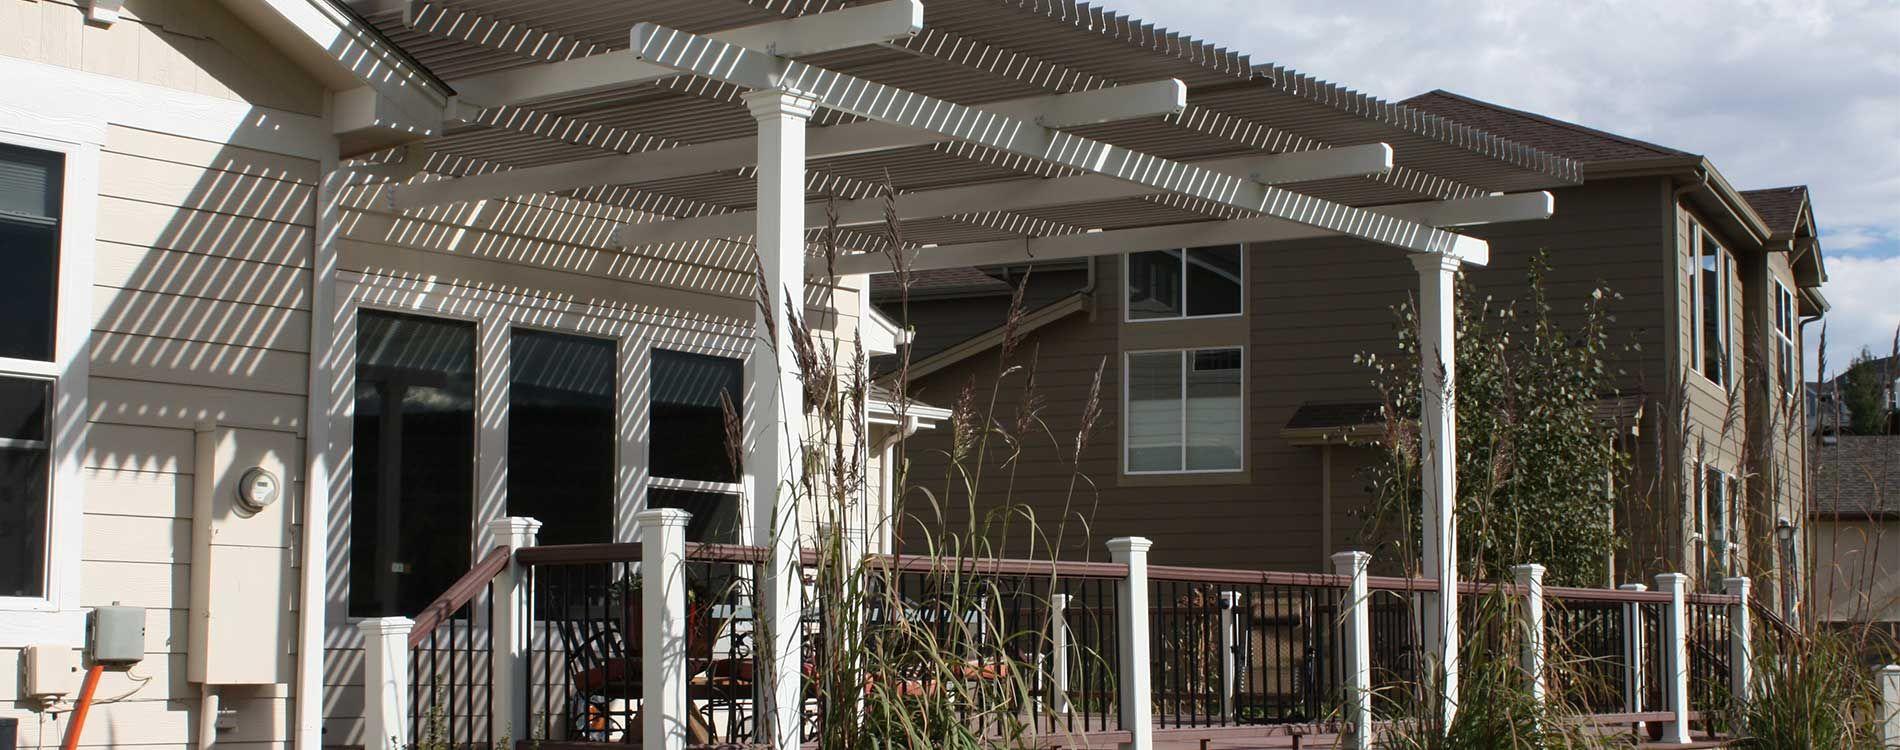 Decks And Patios Denver Colorado Patio Concepts throughout dimensions 1900 X 750